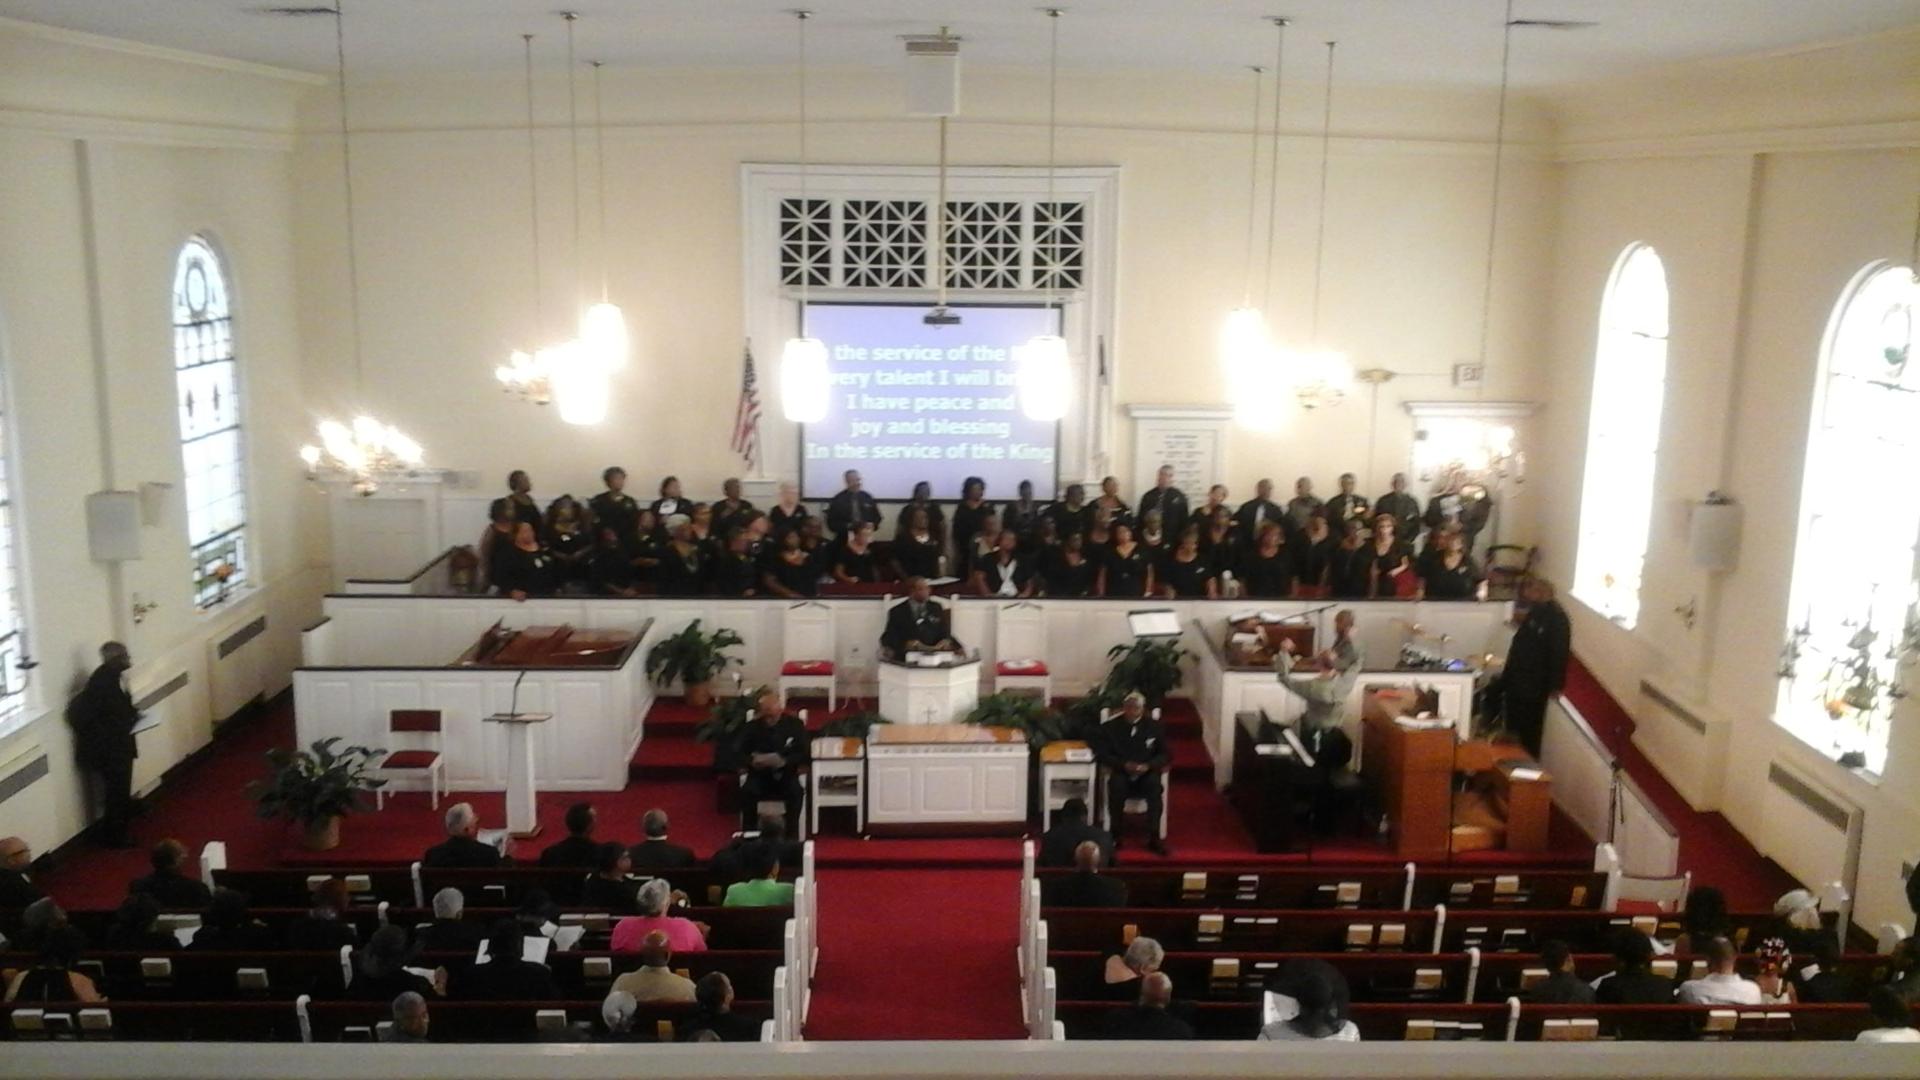 Sanctuary of Green Street Baptist Church